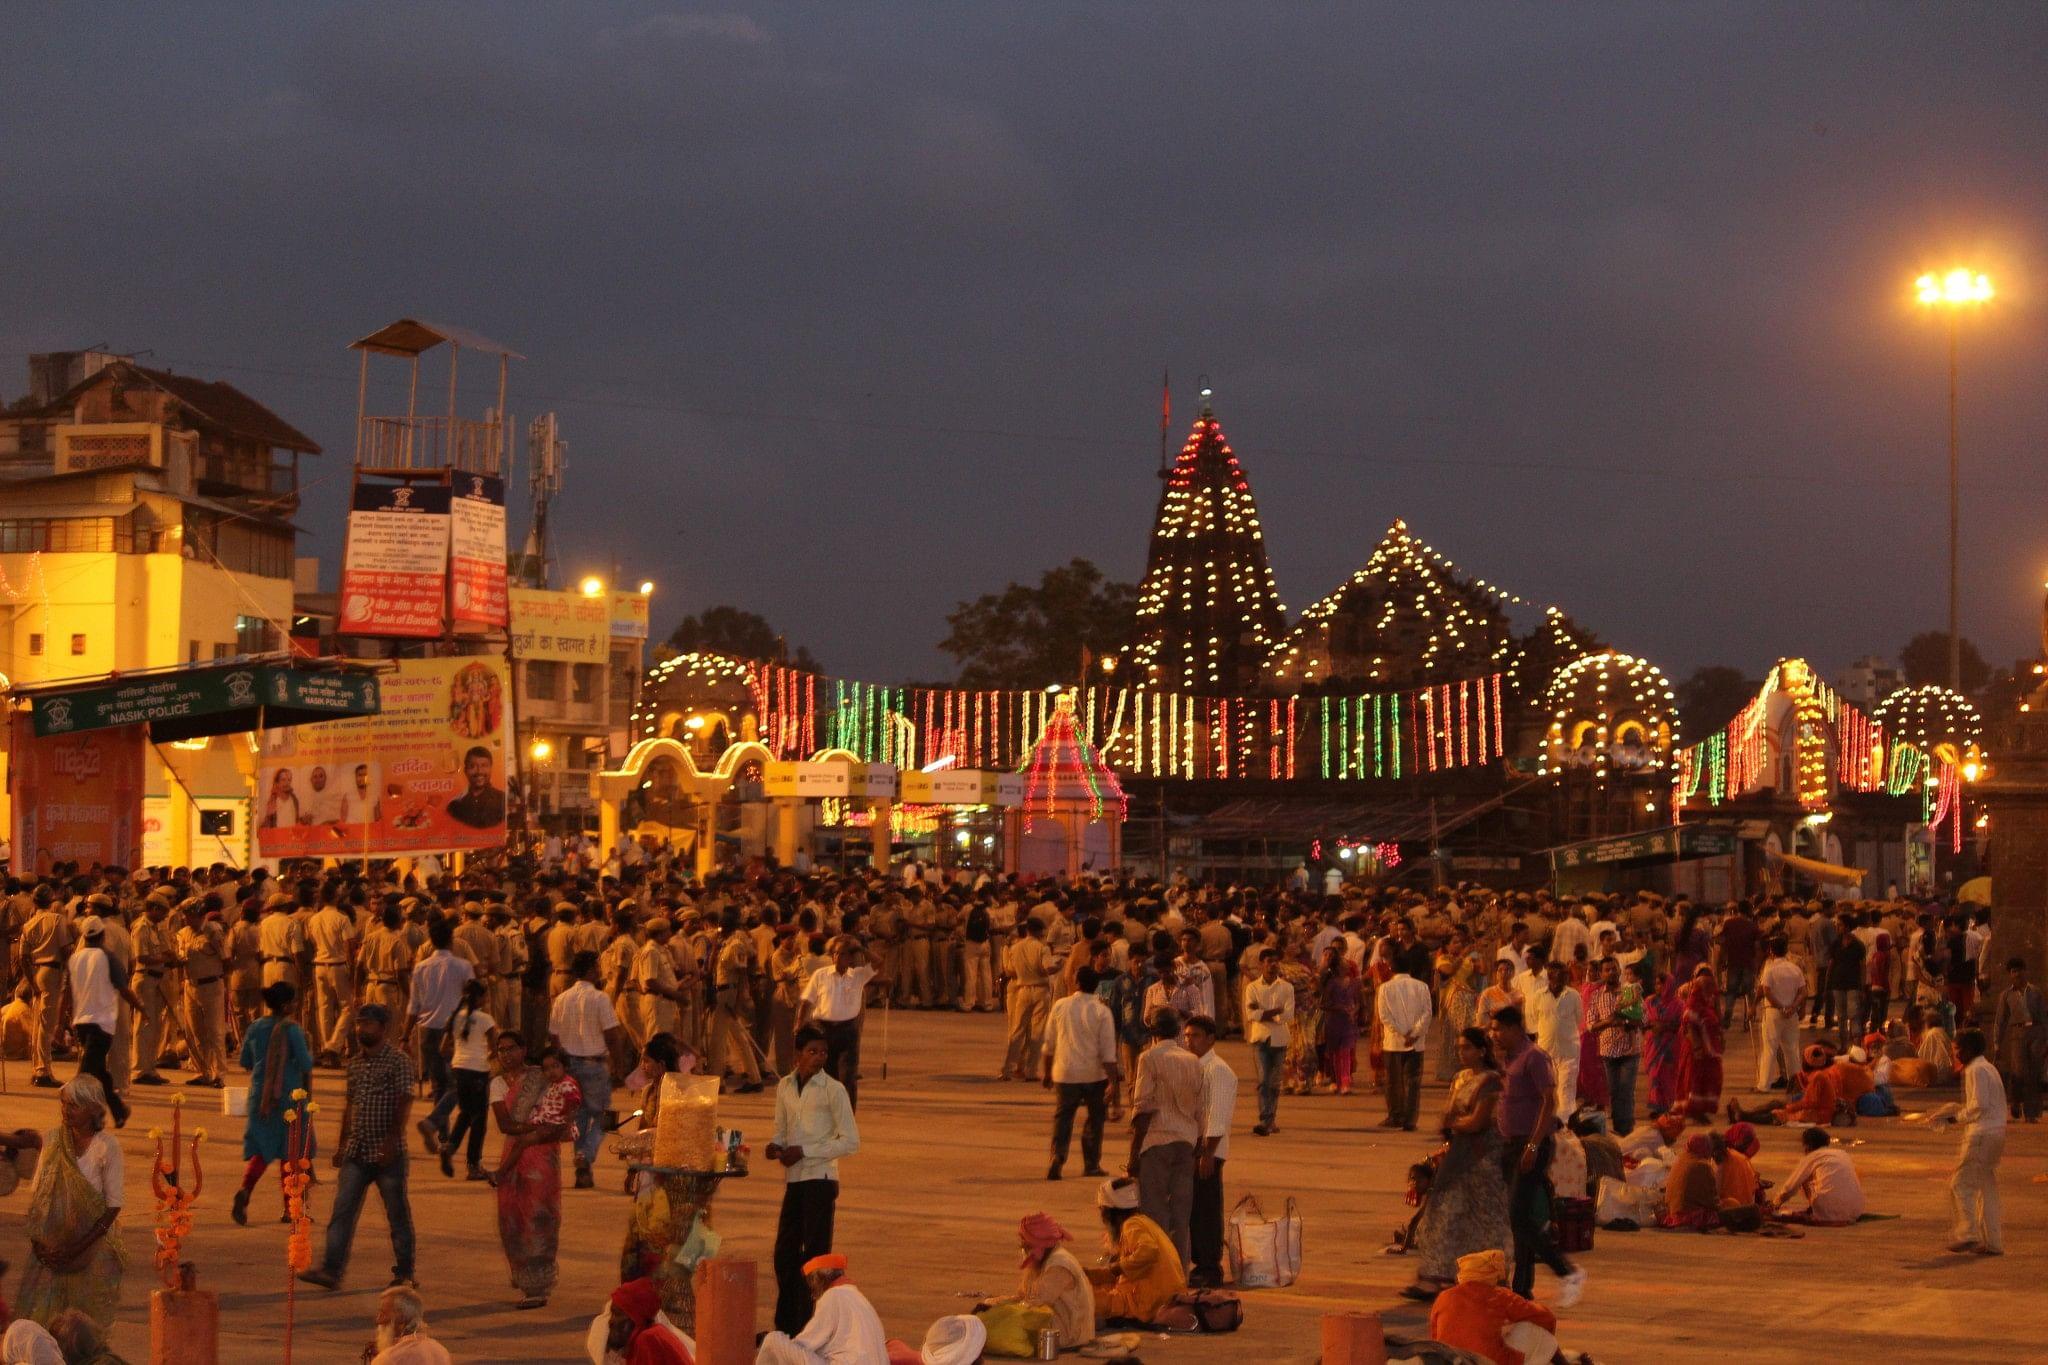 Decorations at night illuminate all temples and bridges, Ramkund, Nashik